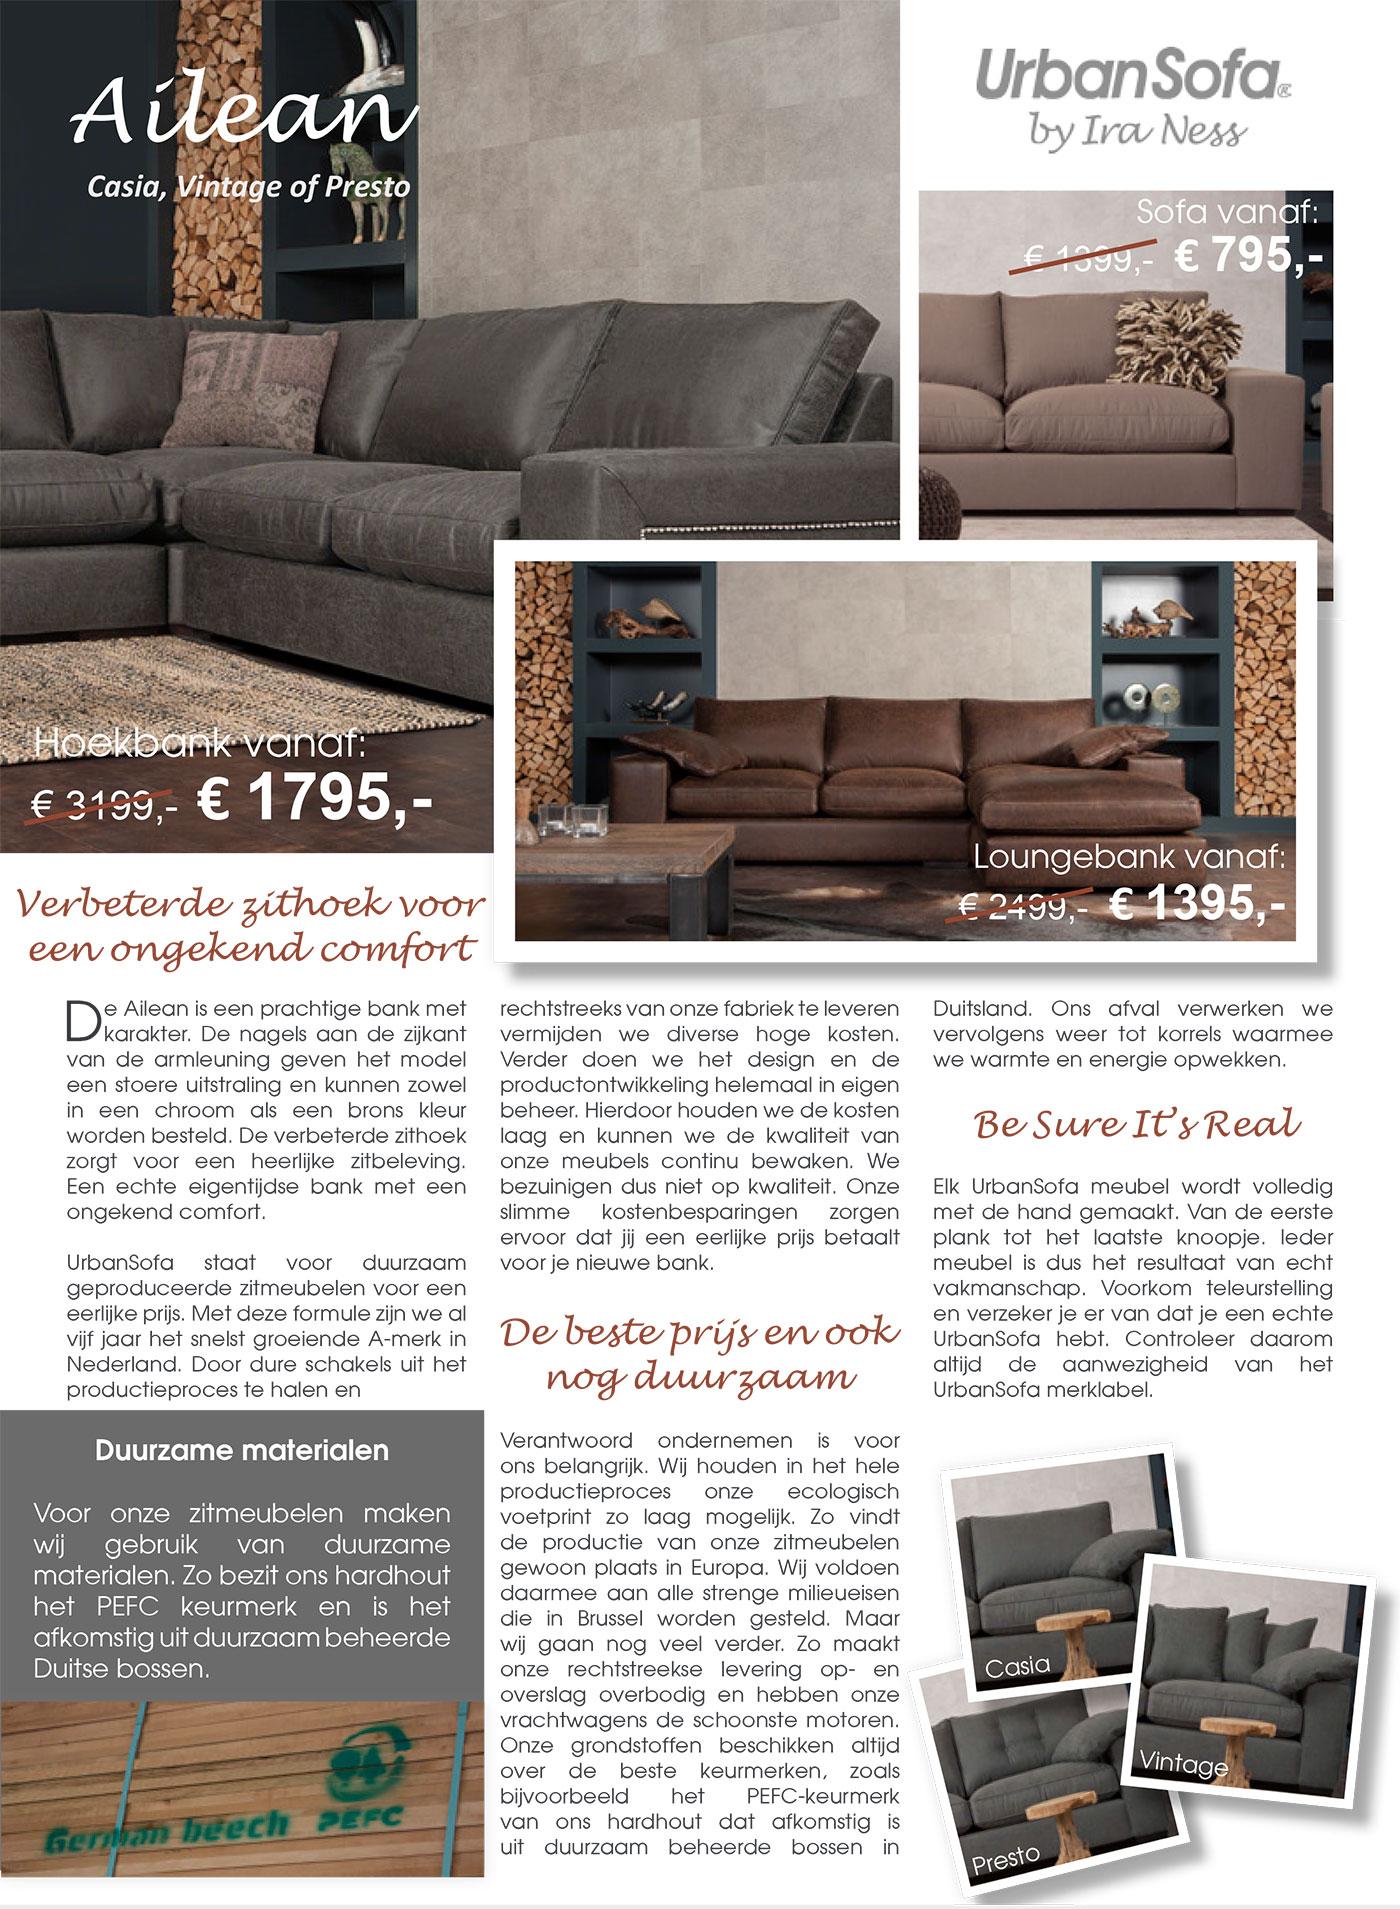 UrbanSofa_Ailean_Sofa_Loungebank_Hoekbank-1